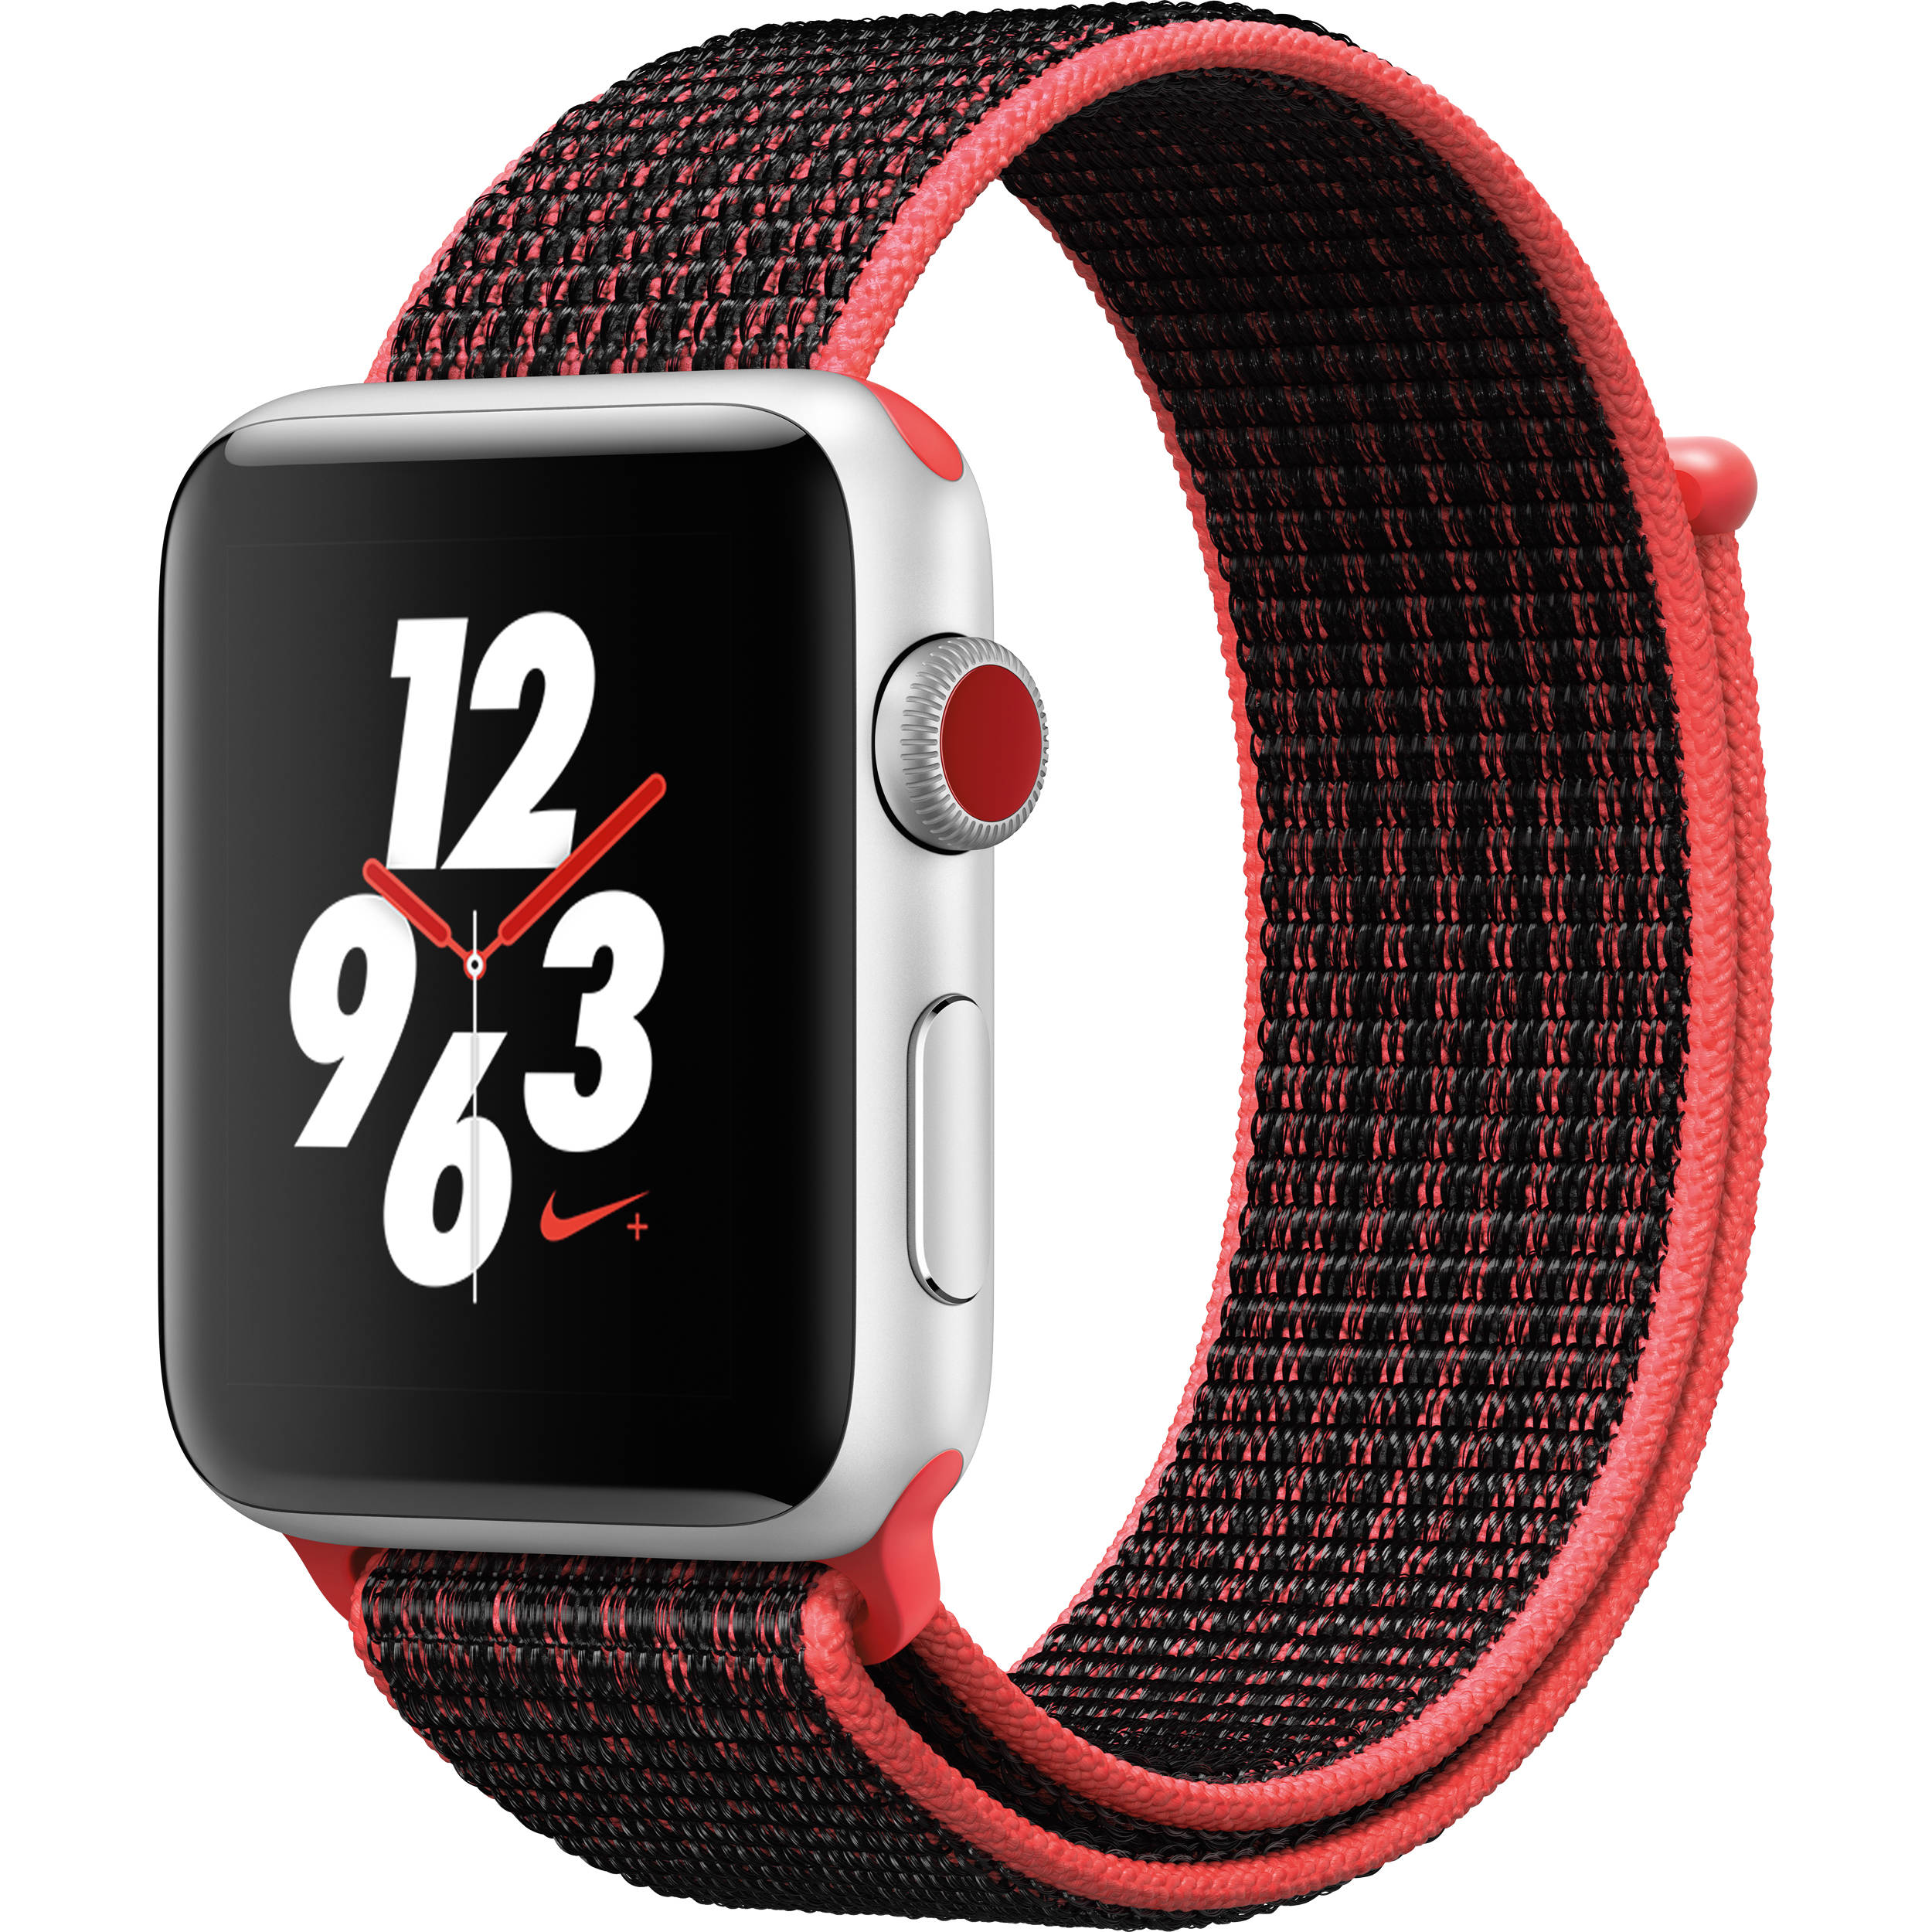 outlet store 0ee81 34ee3 Apple Watch Nike+ Series 3 42mm Smartwatch (GPS + Cellular, Silver Aluminum  Case, Bright Crimson/Black Nike Sport Loop)